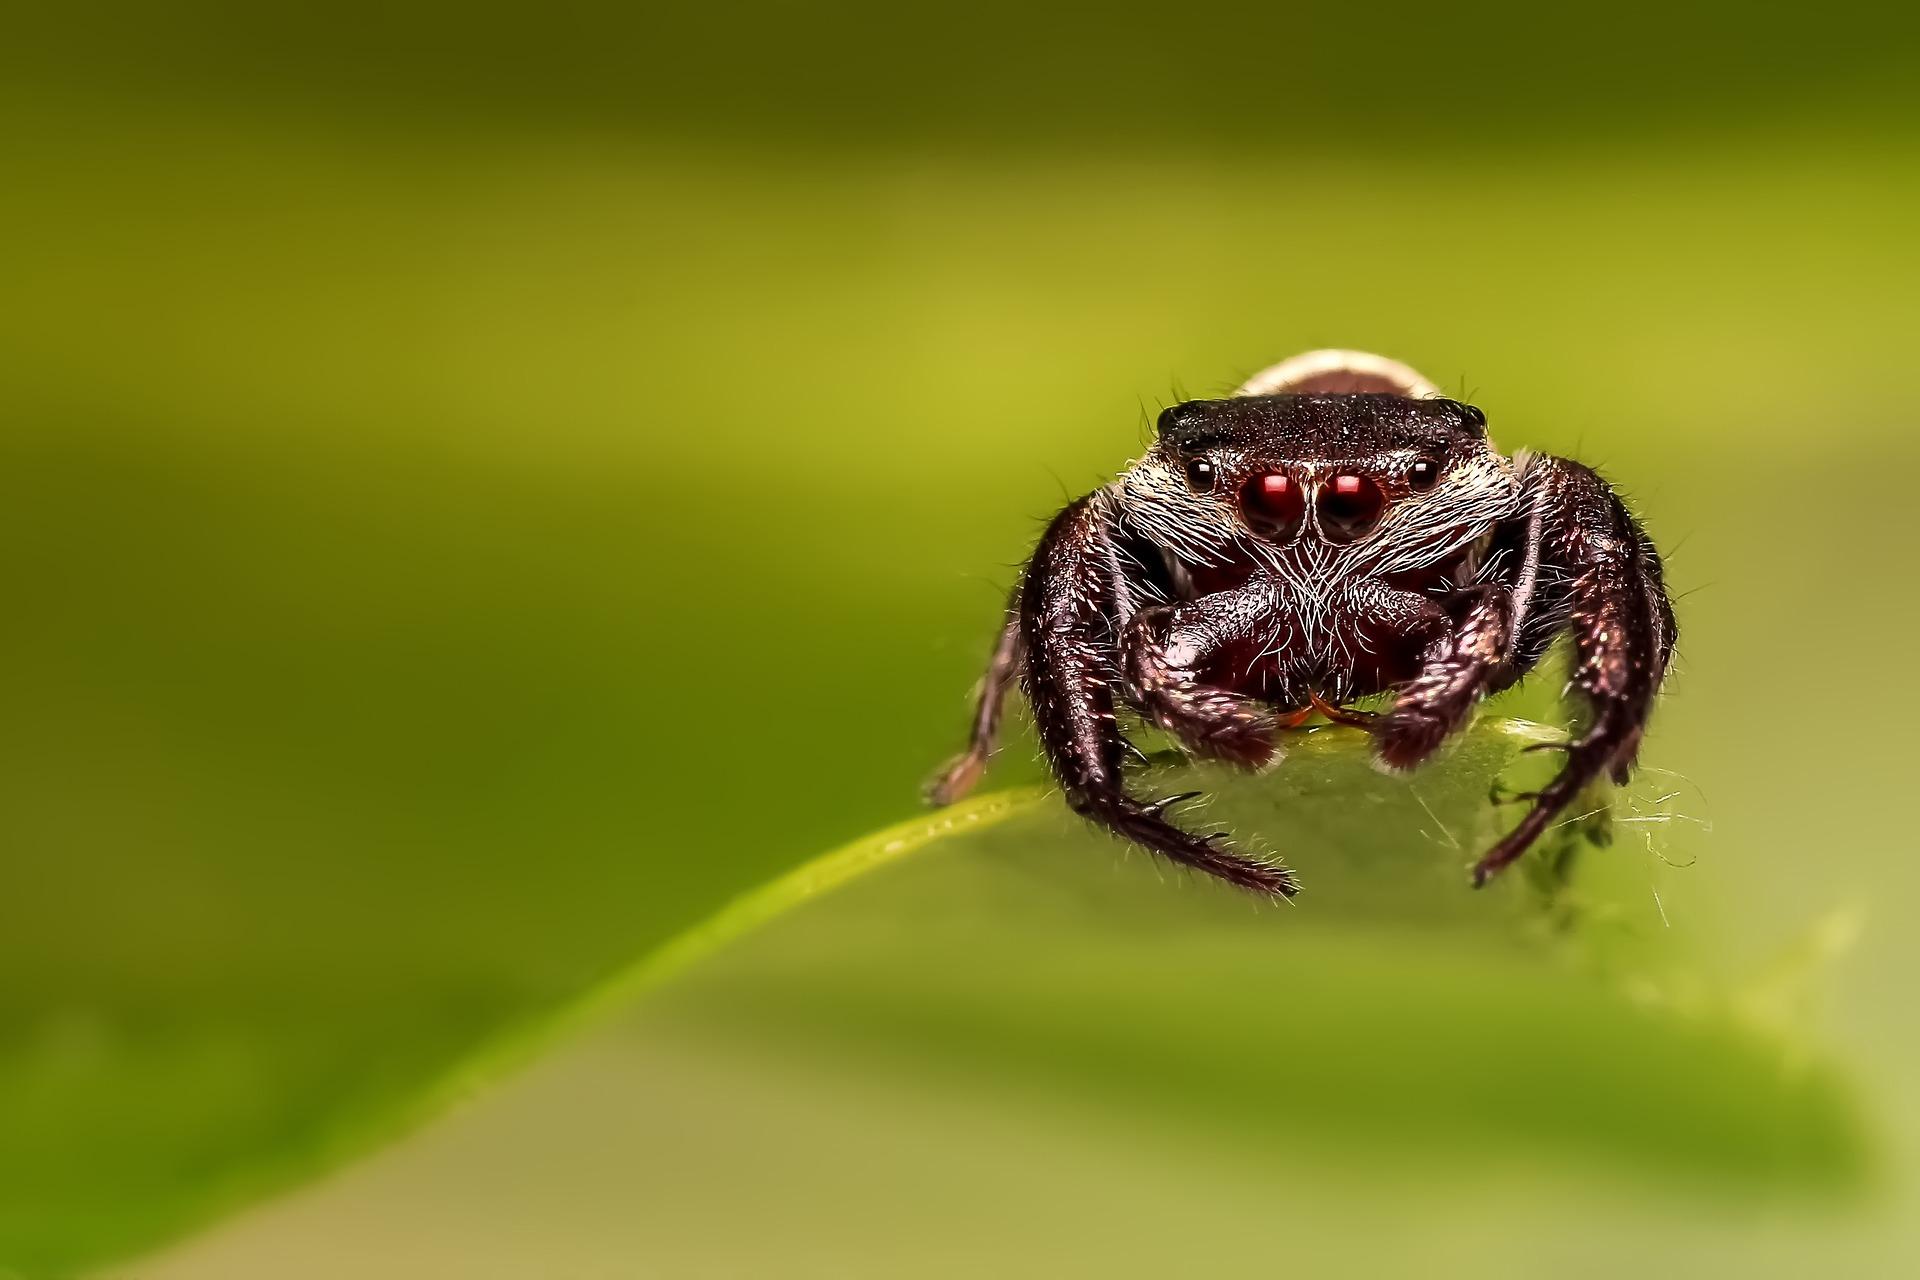 jumping-spider-1137288_1920